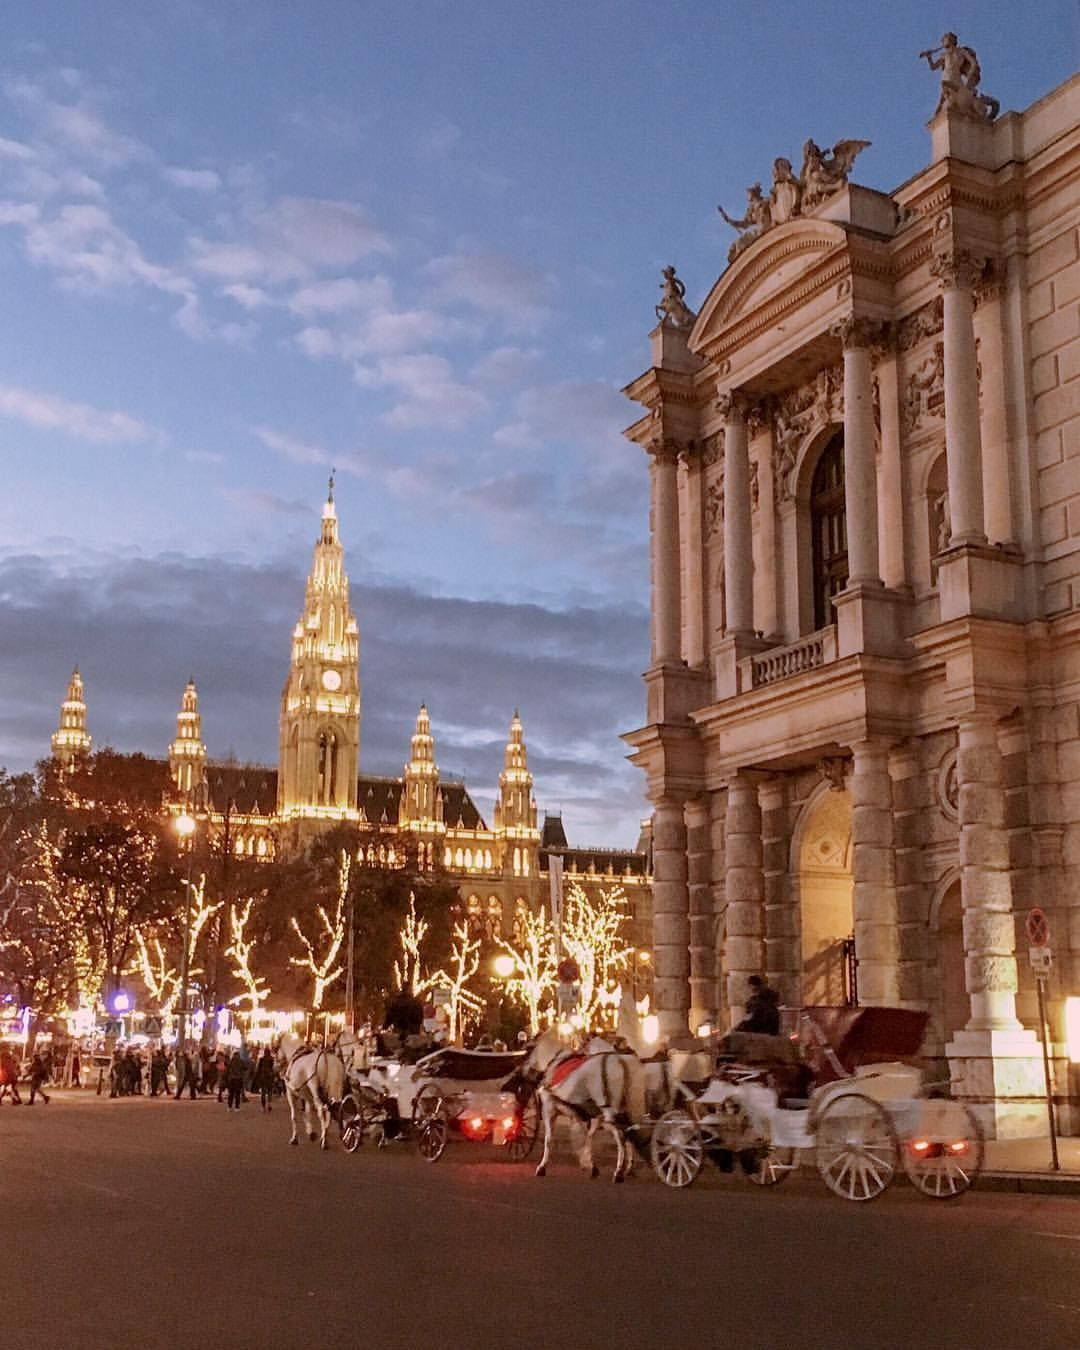 Christmas In Austria 2019.Christmas Market At City Hall Vienna Austria Fantasy 3